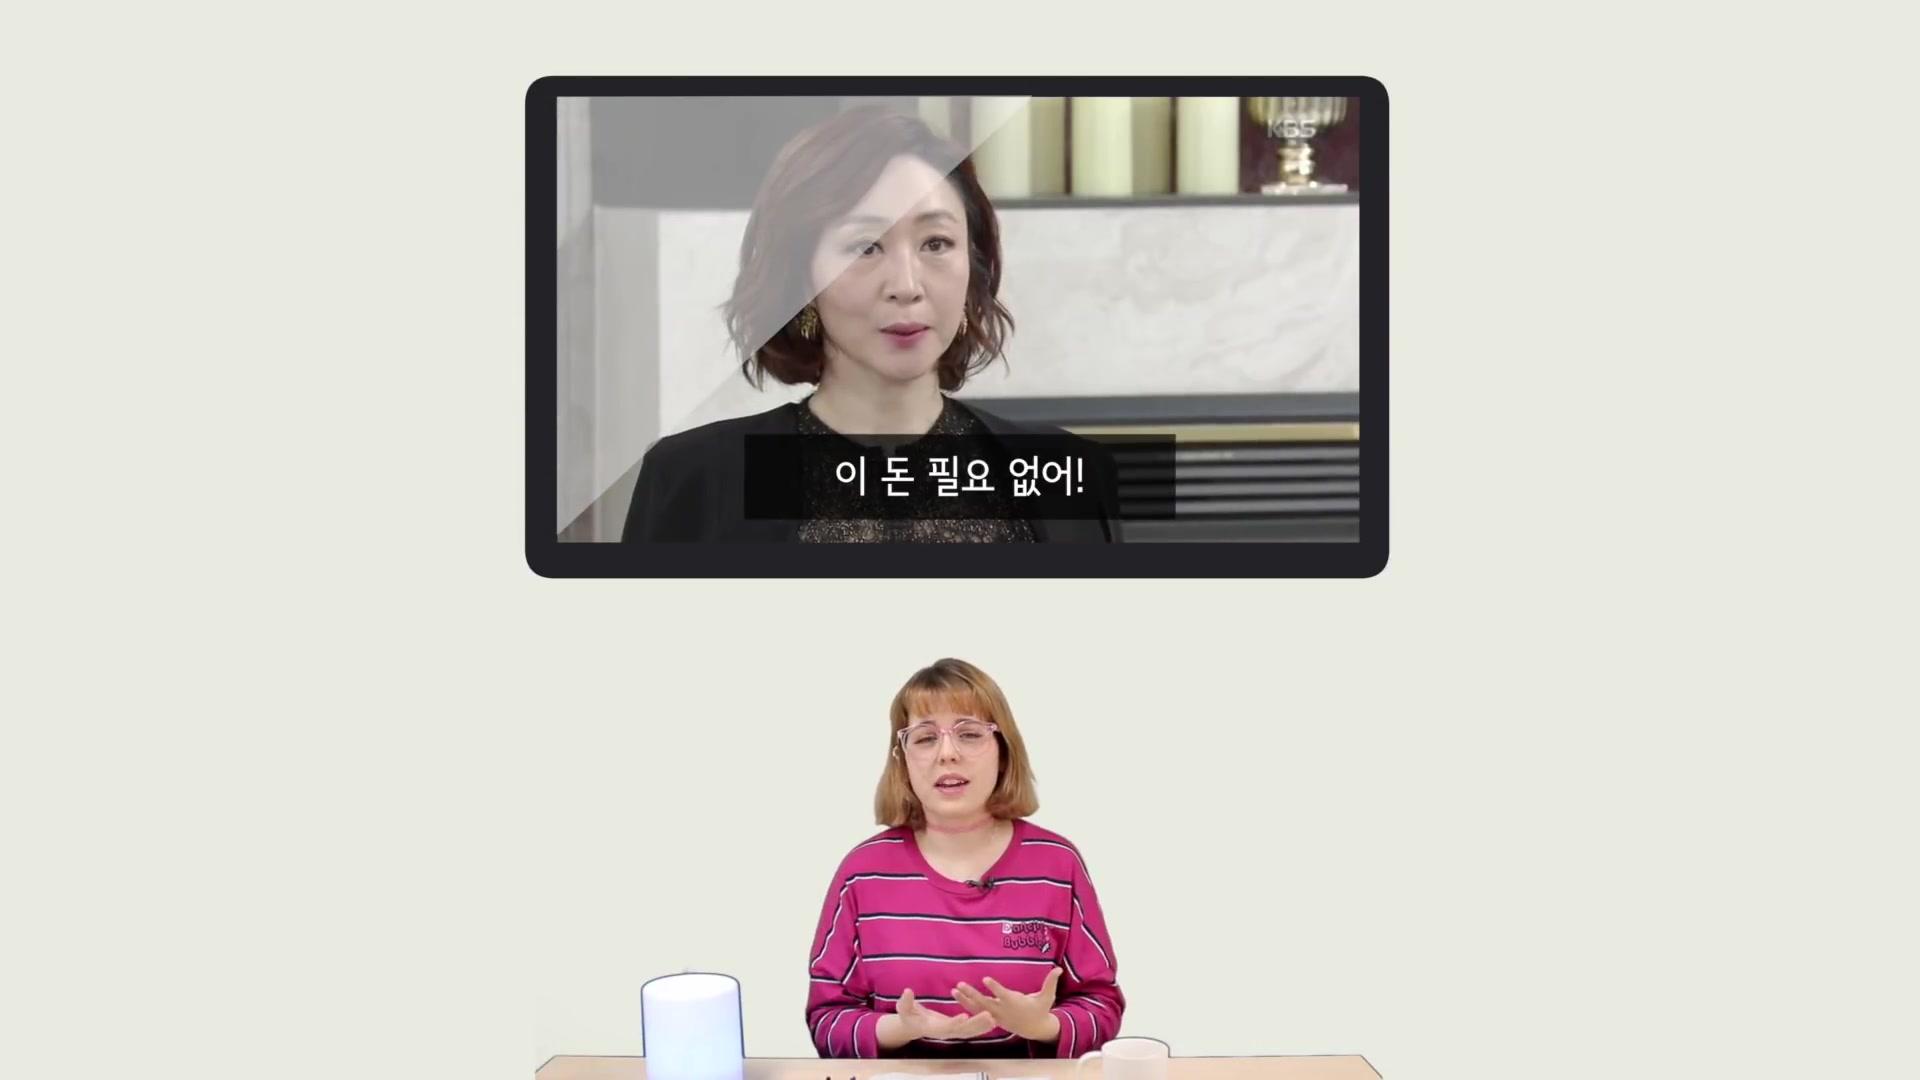 TalkToMeInKorean Episode 180: 3 Ways To Improve Your Listening Skills (Korean Study Hacks) [TalkToMeInKorean]